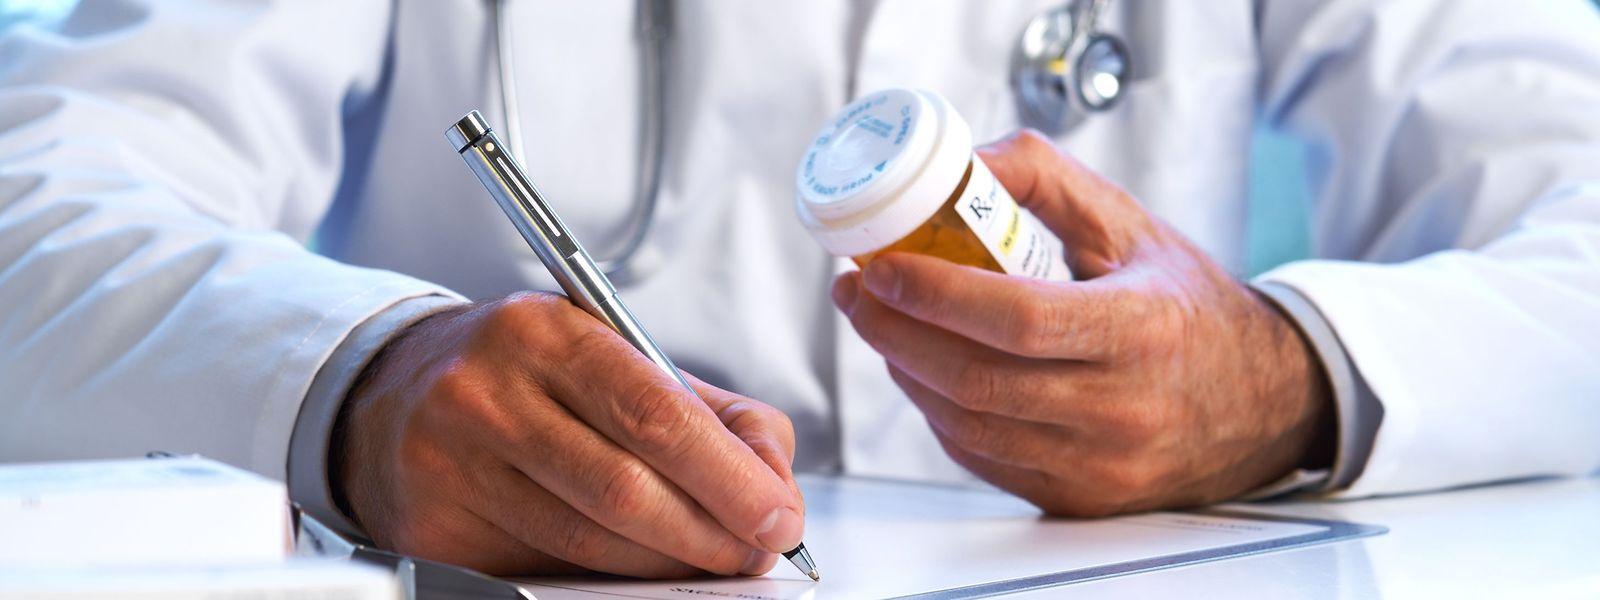 Viele Patienten seltener Erkrankungen erhalten am Anfang falsche Diagnosen. Der Nationale Plan soll den Zugang zu Diagnosemaßnahmen vereinfachen sowie präventive Maßnahmen verstärken.